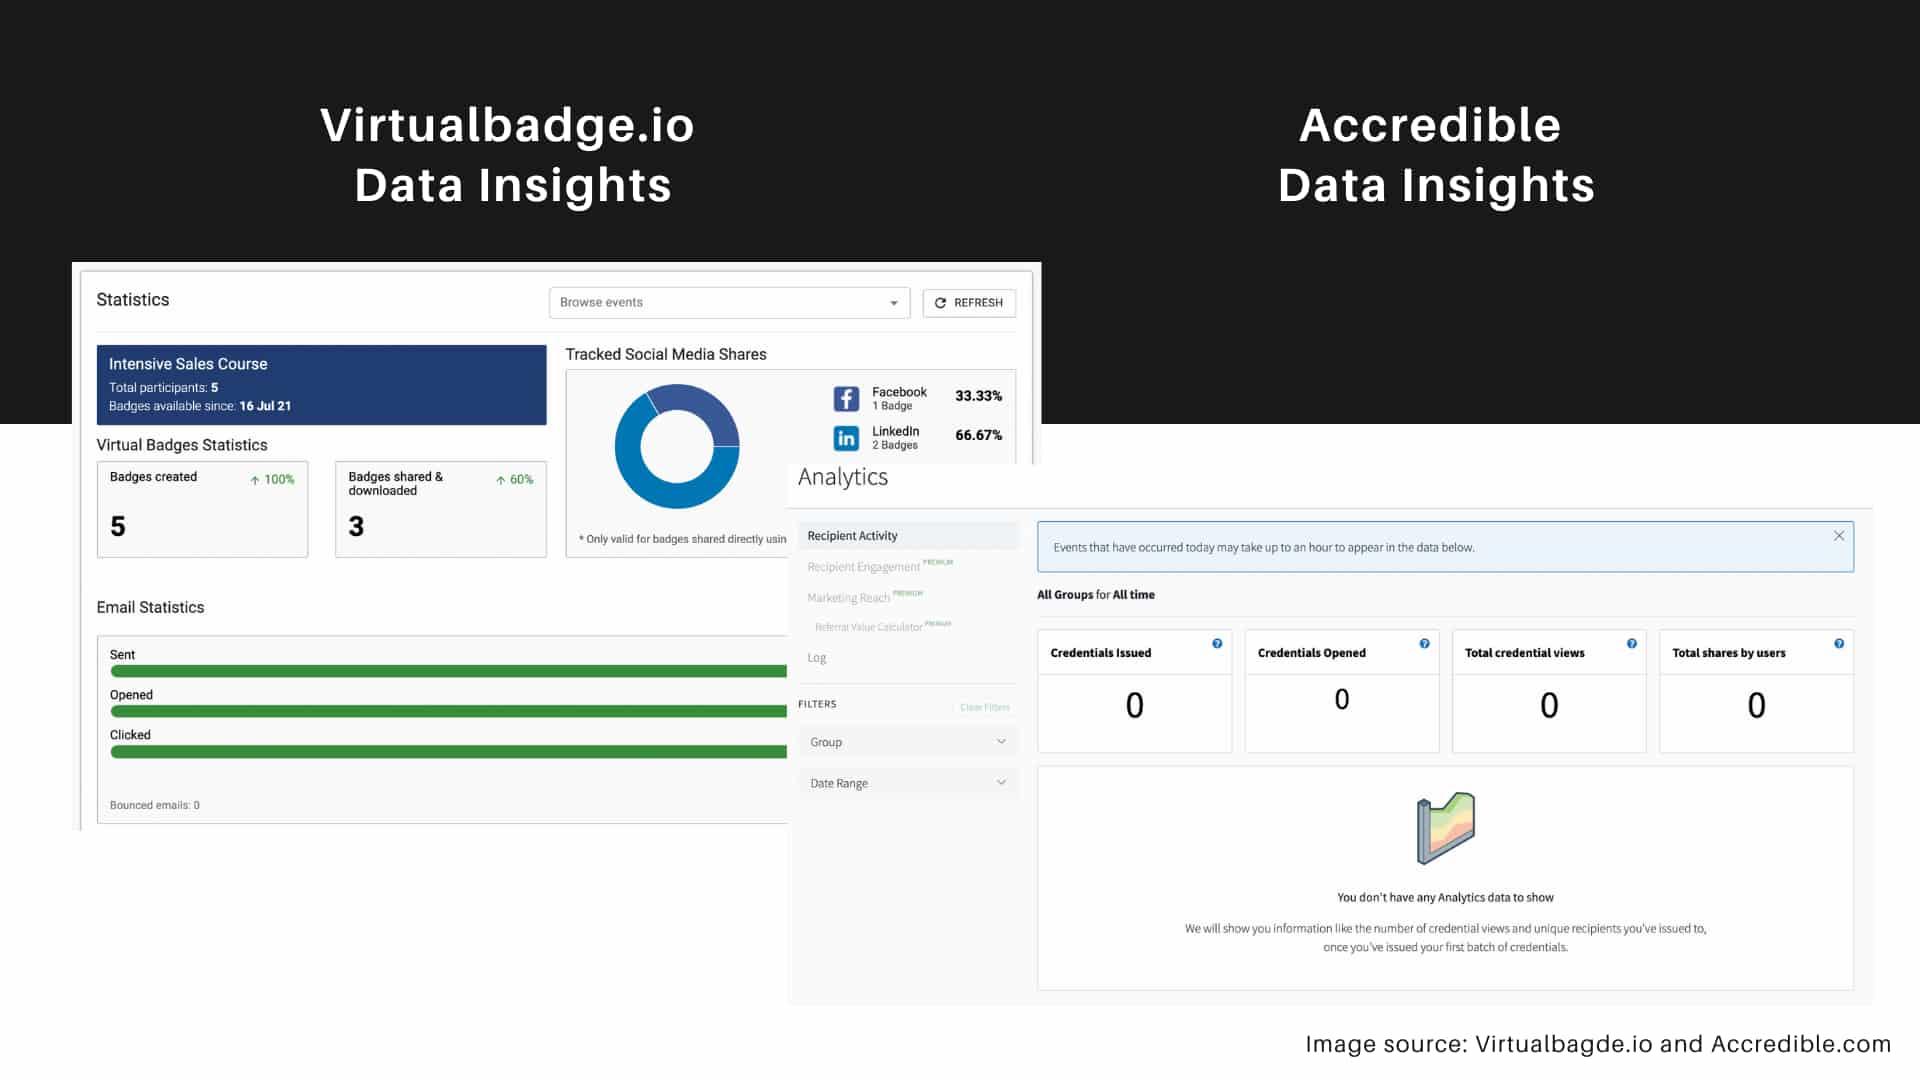 data insights feature - Acredible vs Virtualbadge.io